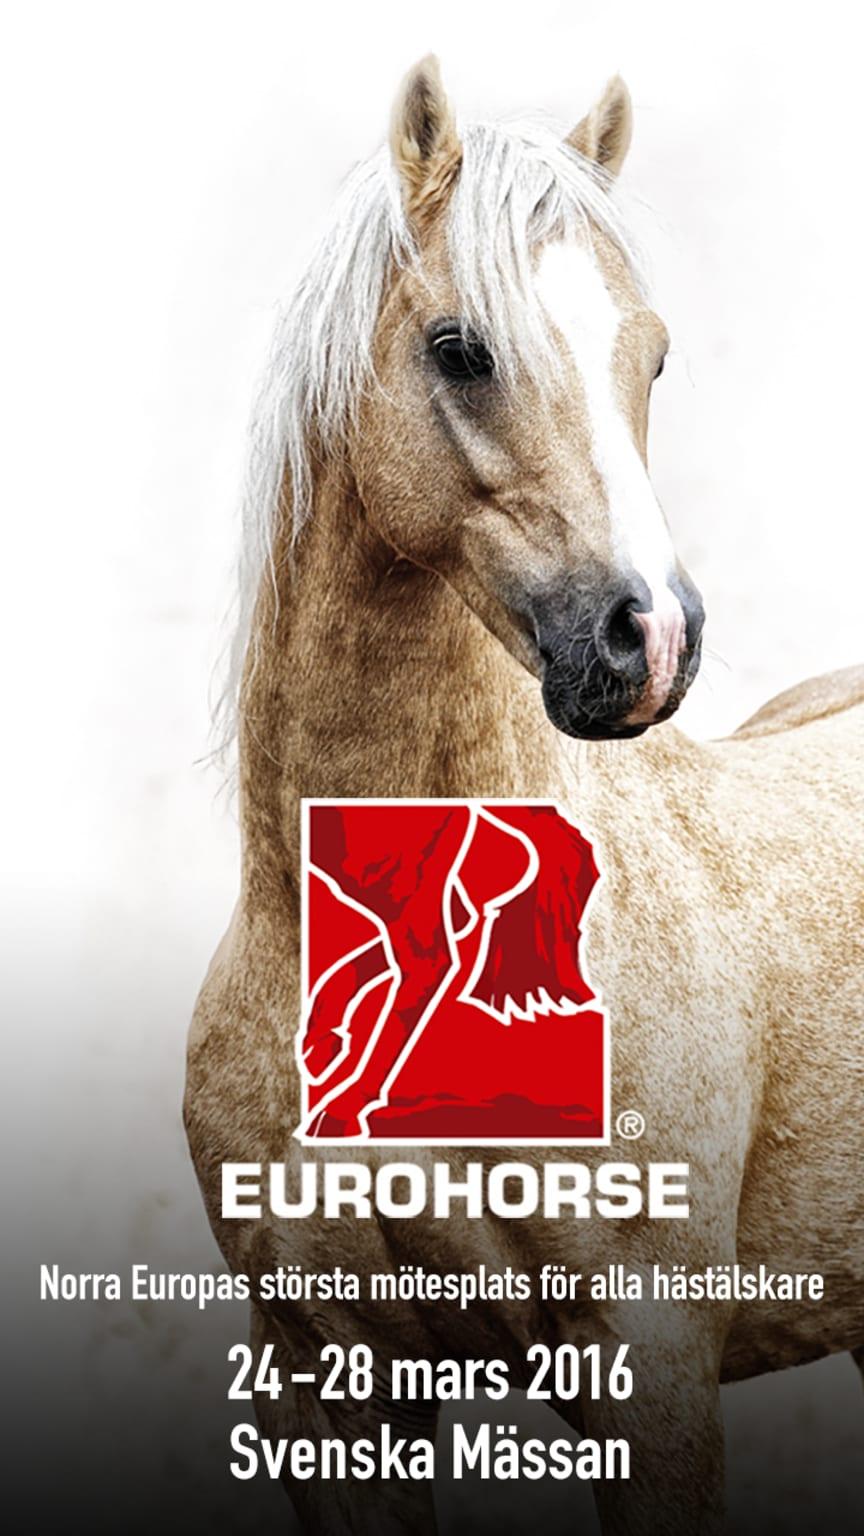 EuroHorse